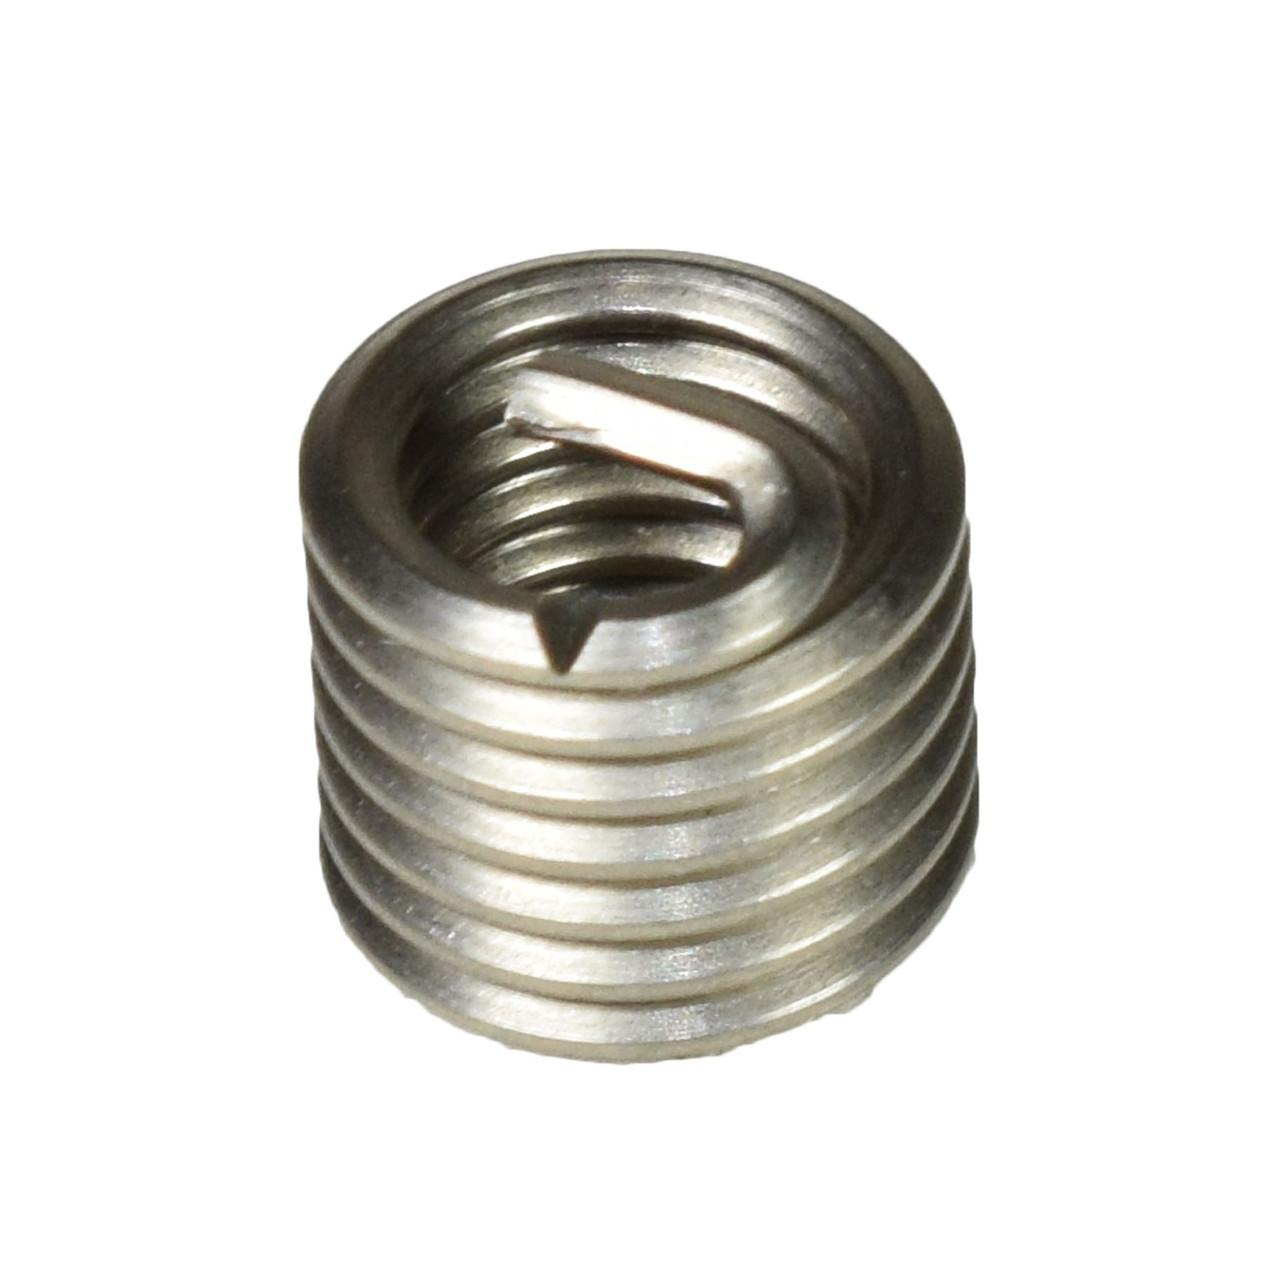 Helicoil Type Thread Repair Inserts 5//16 UNC x 1.5D 10pc Wire Thread Insert